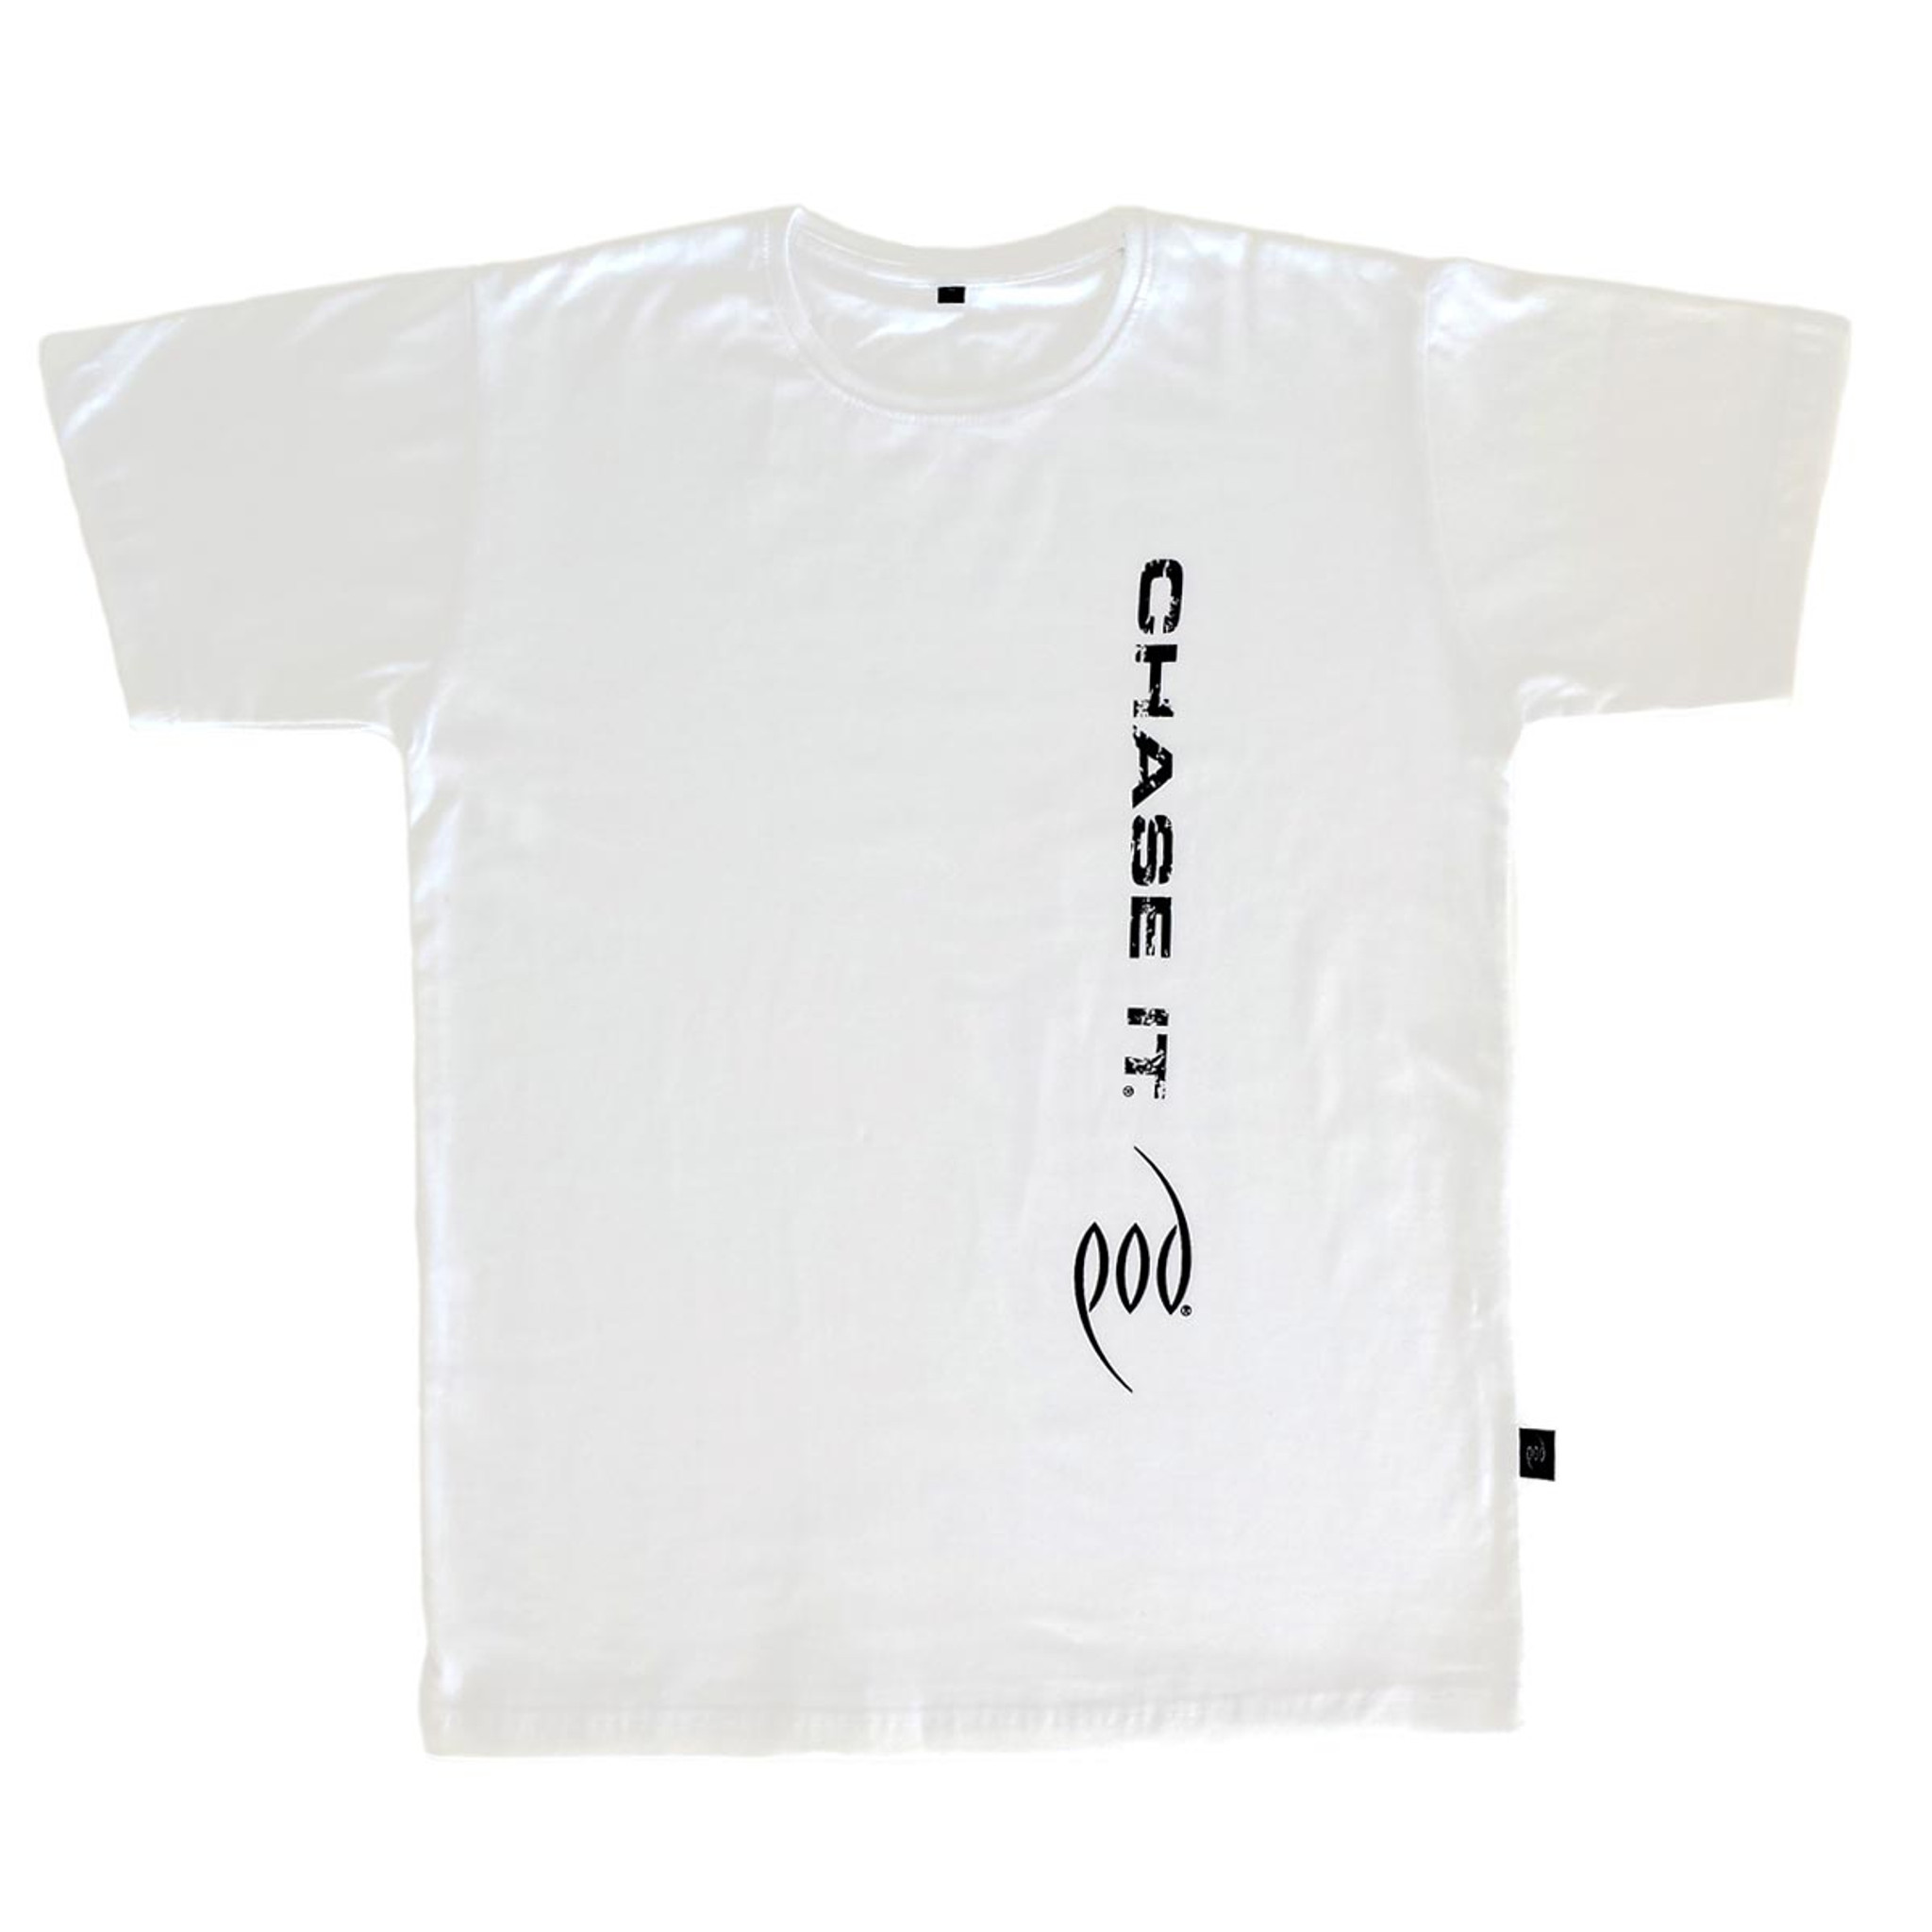 White with black print